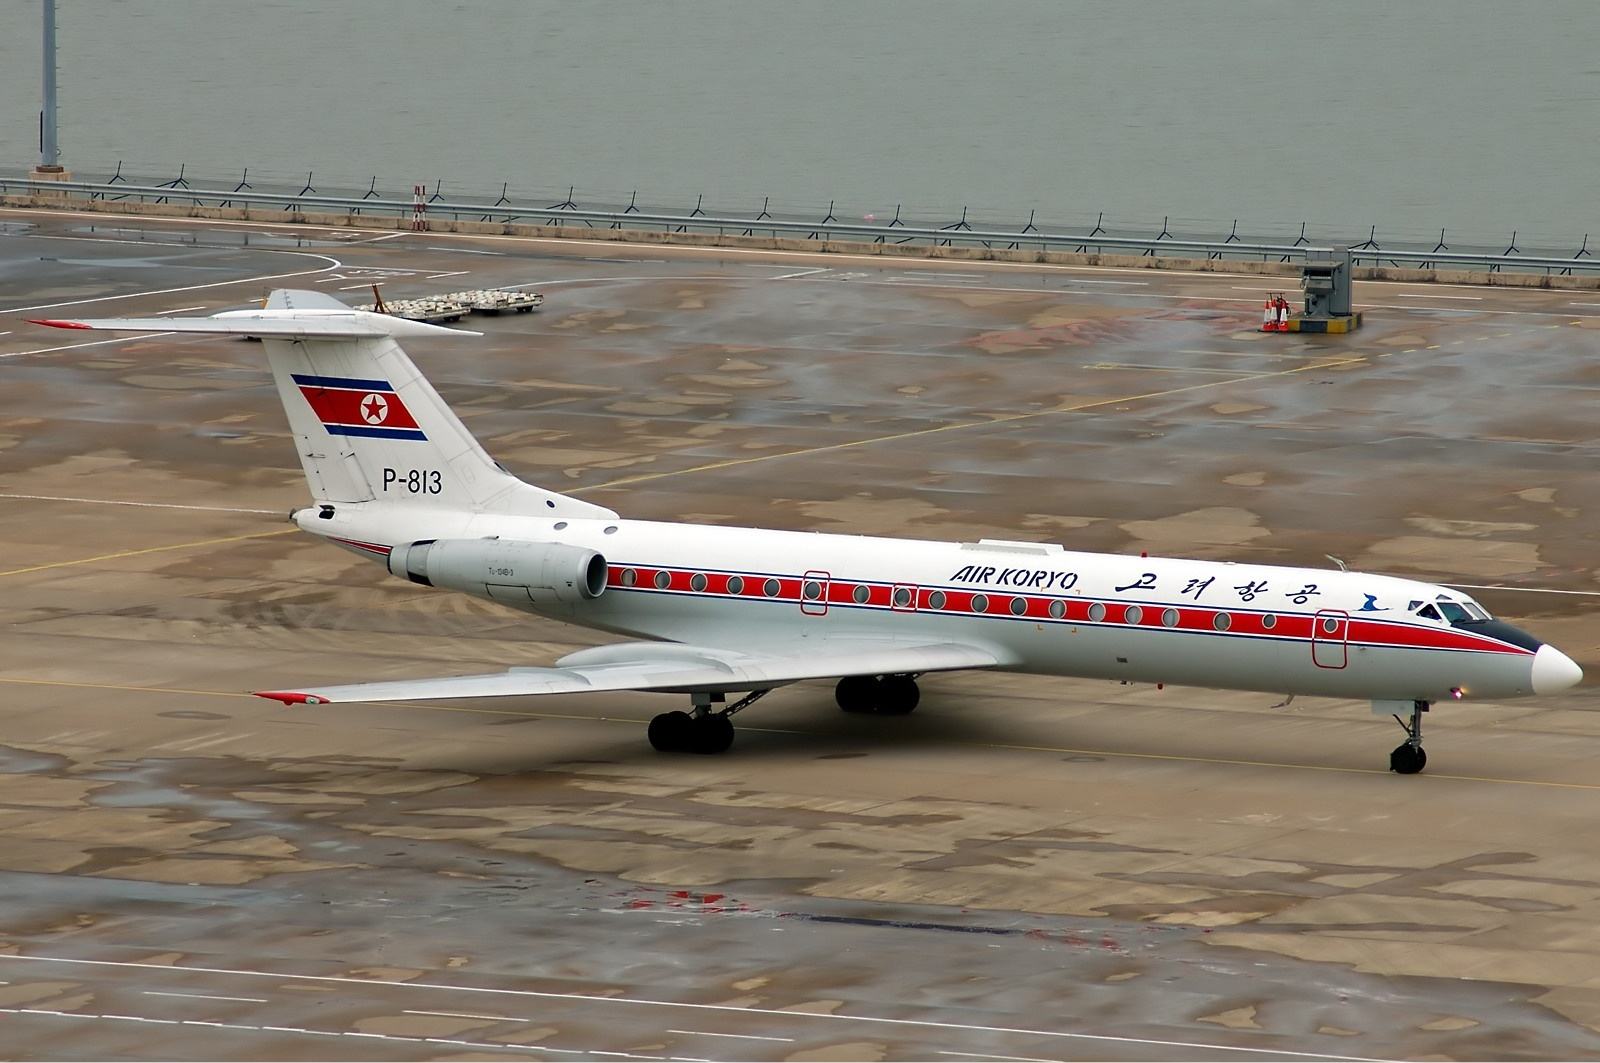 Air_Koryo_Tupolev_Tu-134_Tang-1